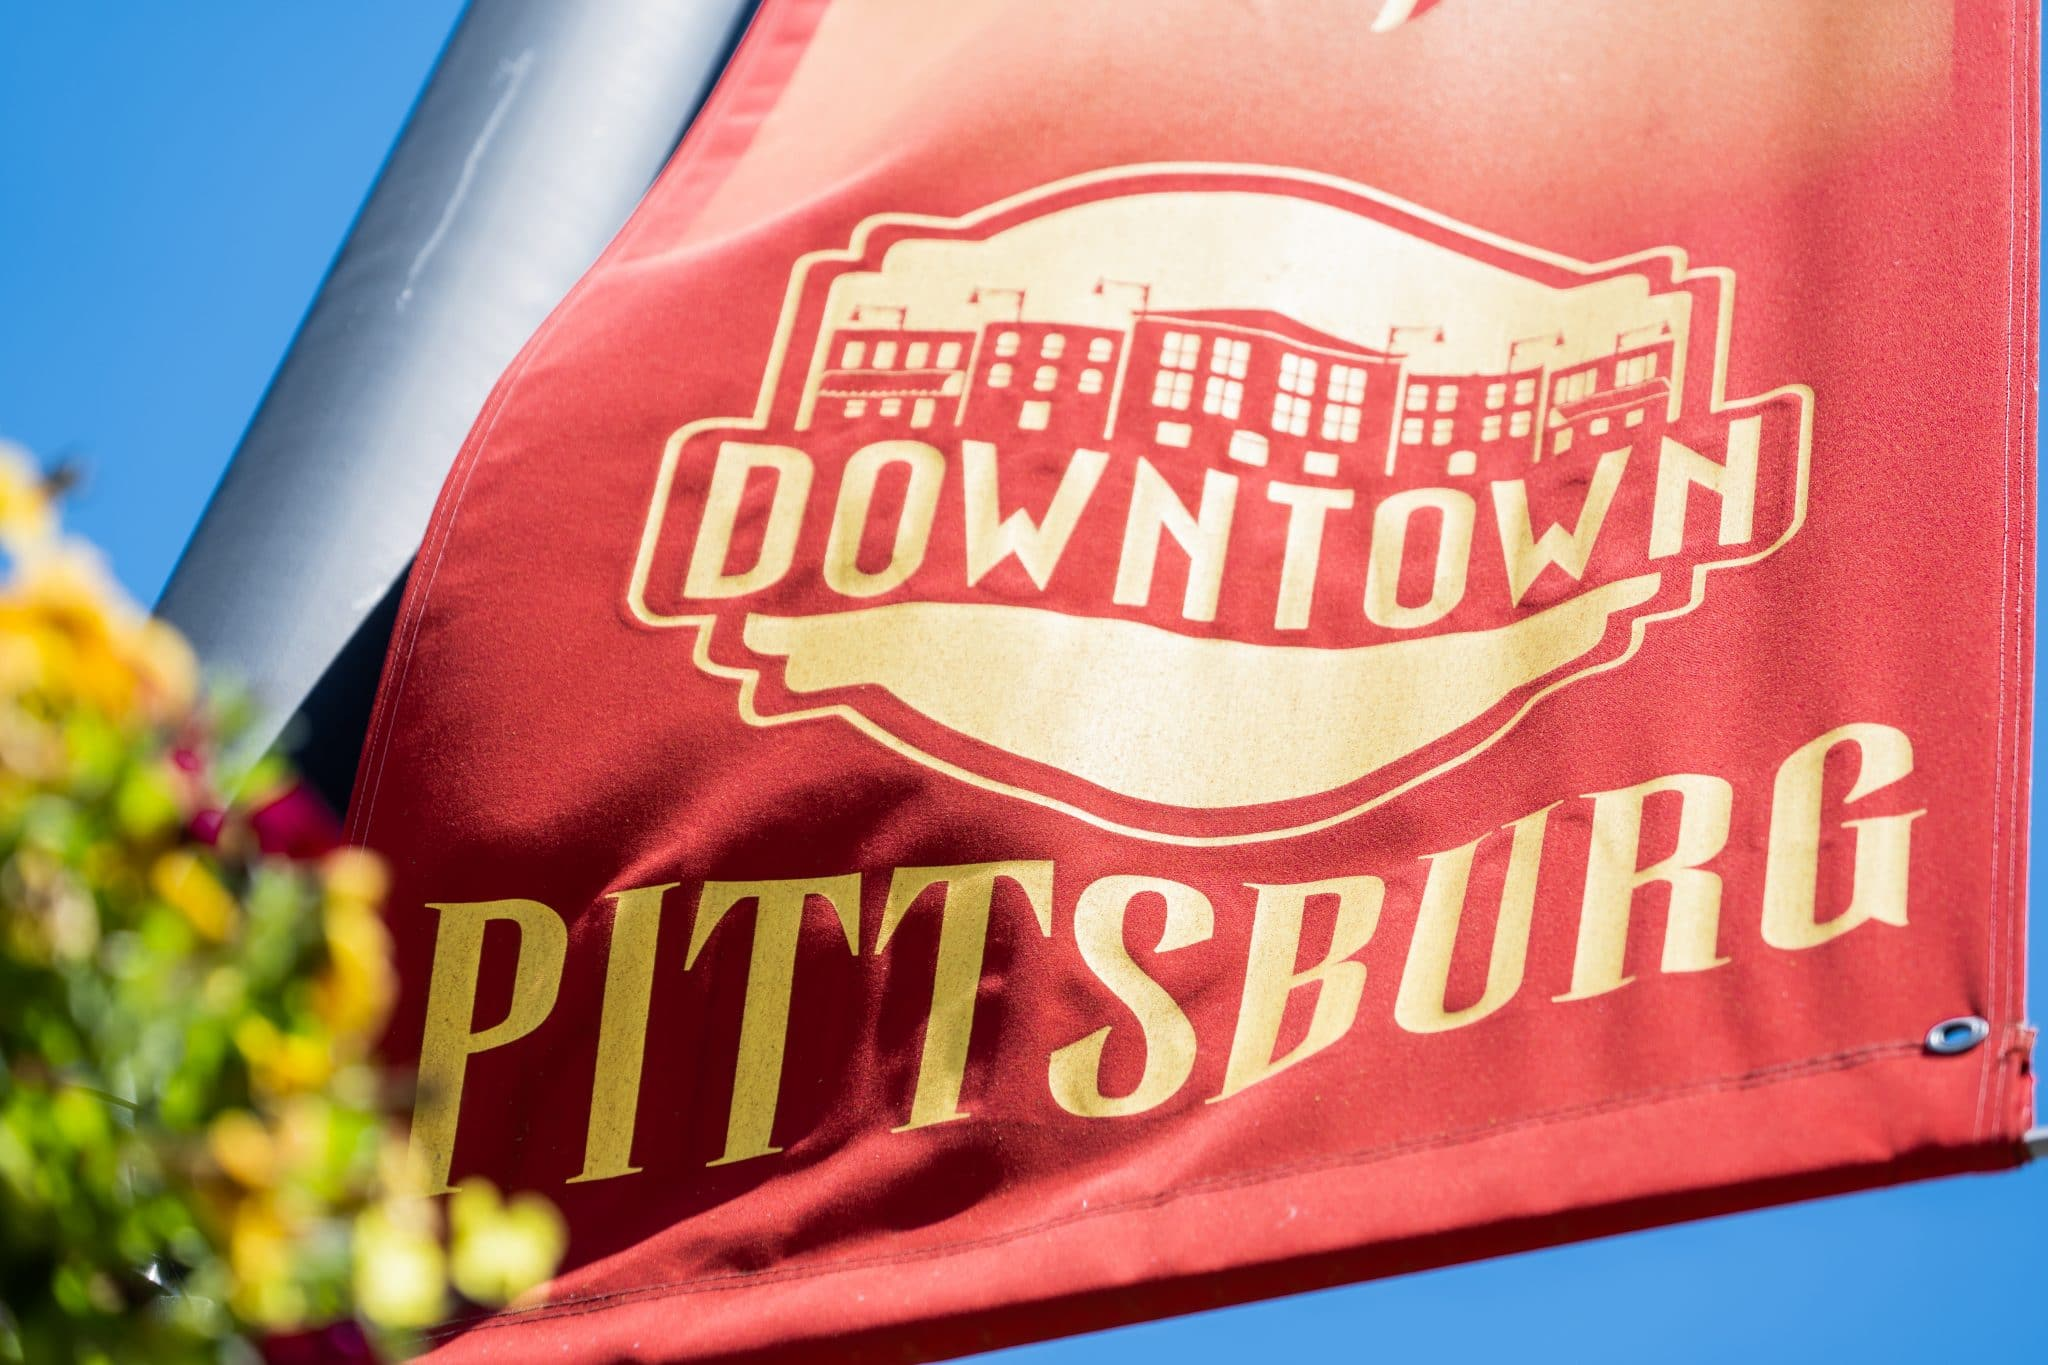 Pittsburg City Commission meeting recap – Feb. 9, 2021